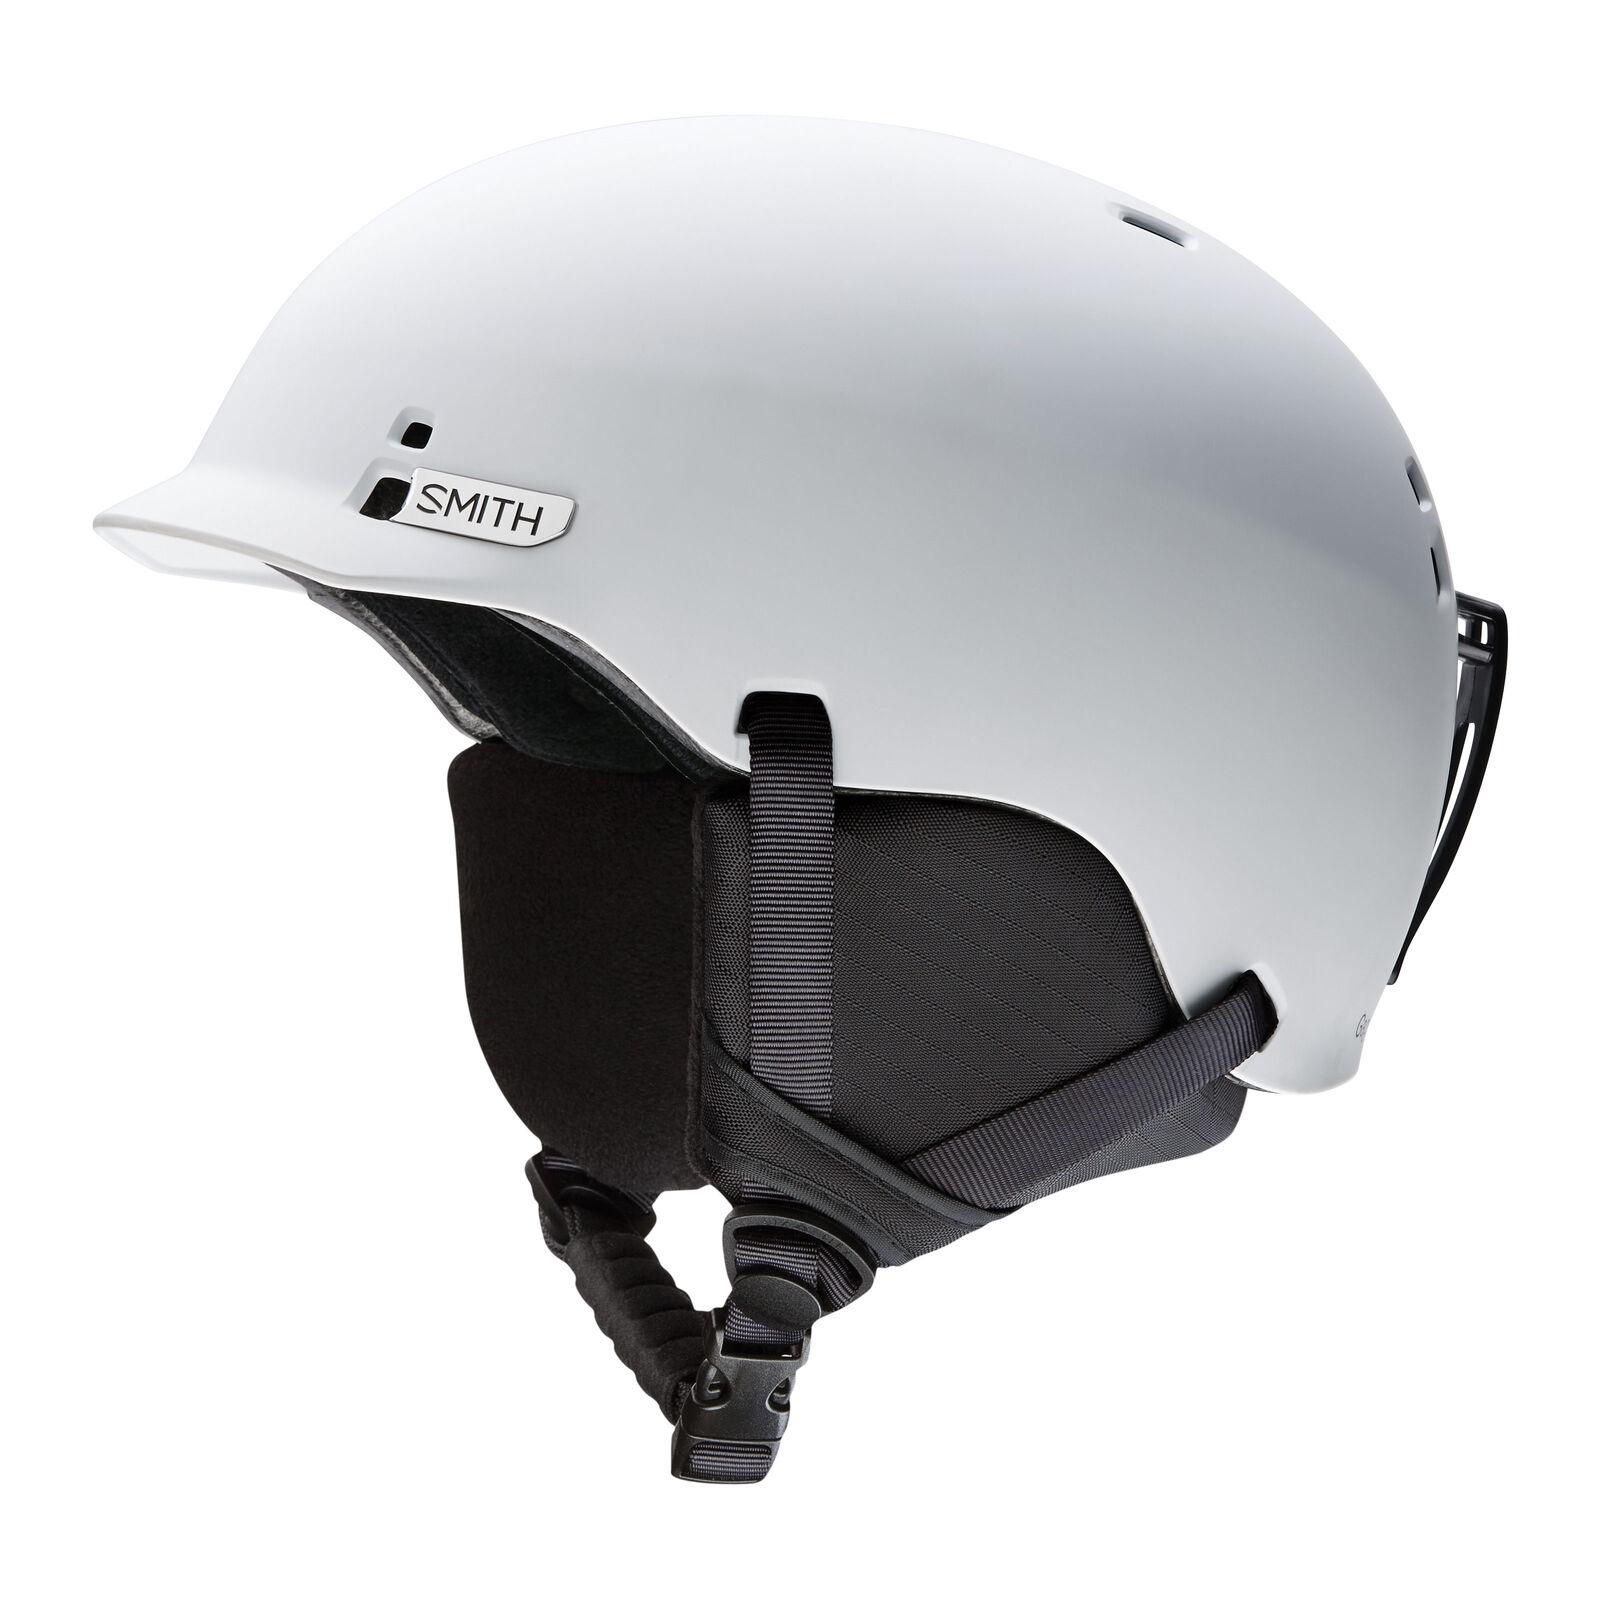 Smith Casco  de Snowboard Esquí Gage Junior whiteo colors Lisos Ohrenpolster  best offer